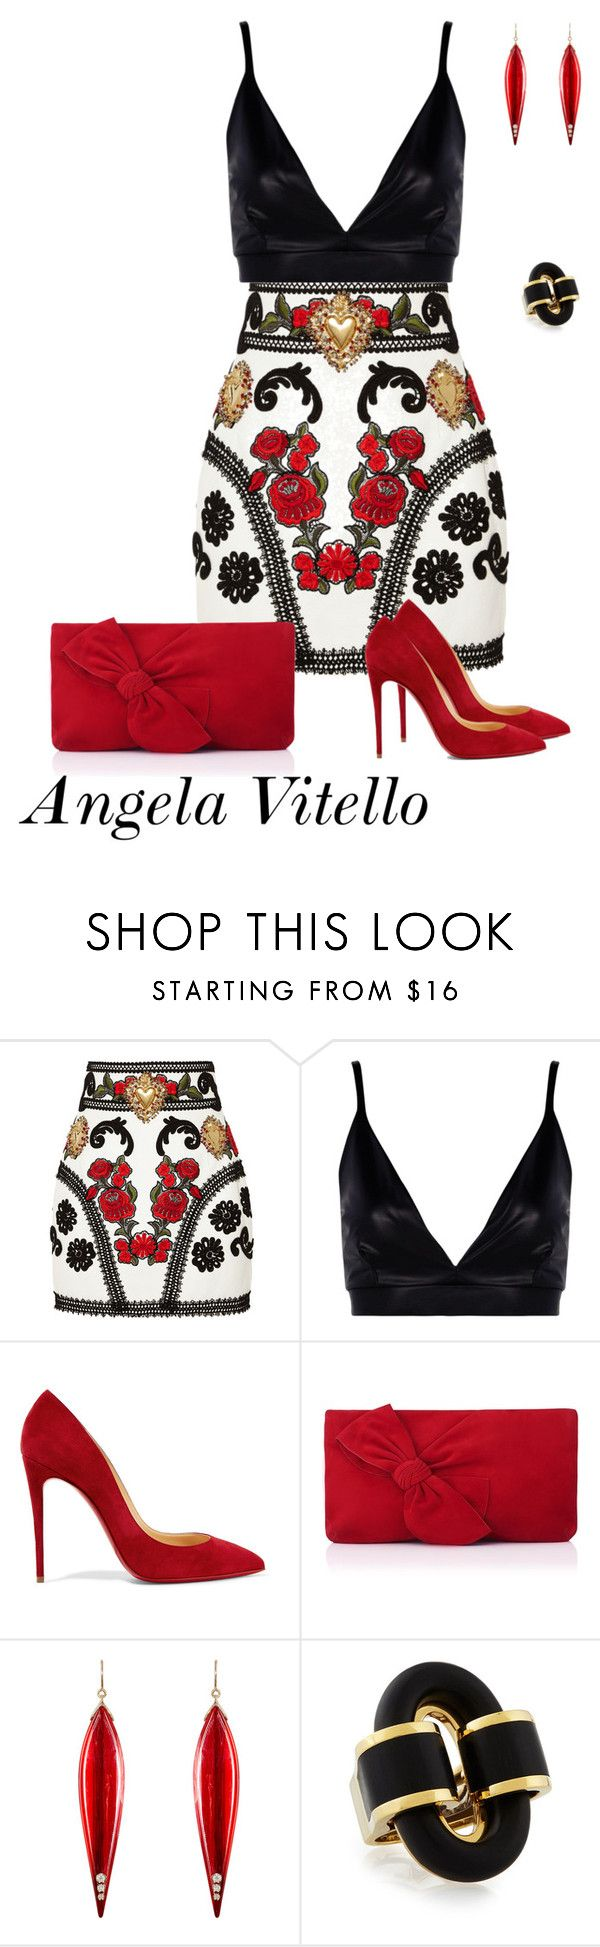 Untitled #839 by angela-vitello on Polyvore featuring Dolce&Gabbana, Boohoo, Christian Louboutin, L.K.Bennett and Mark Davis